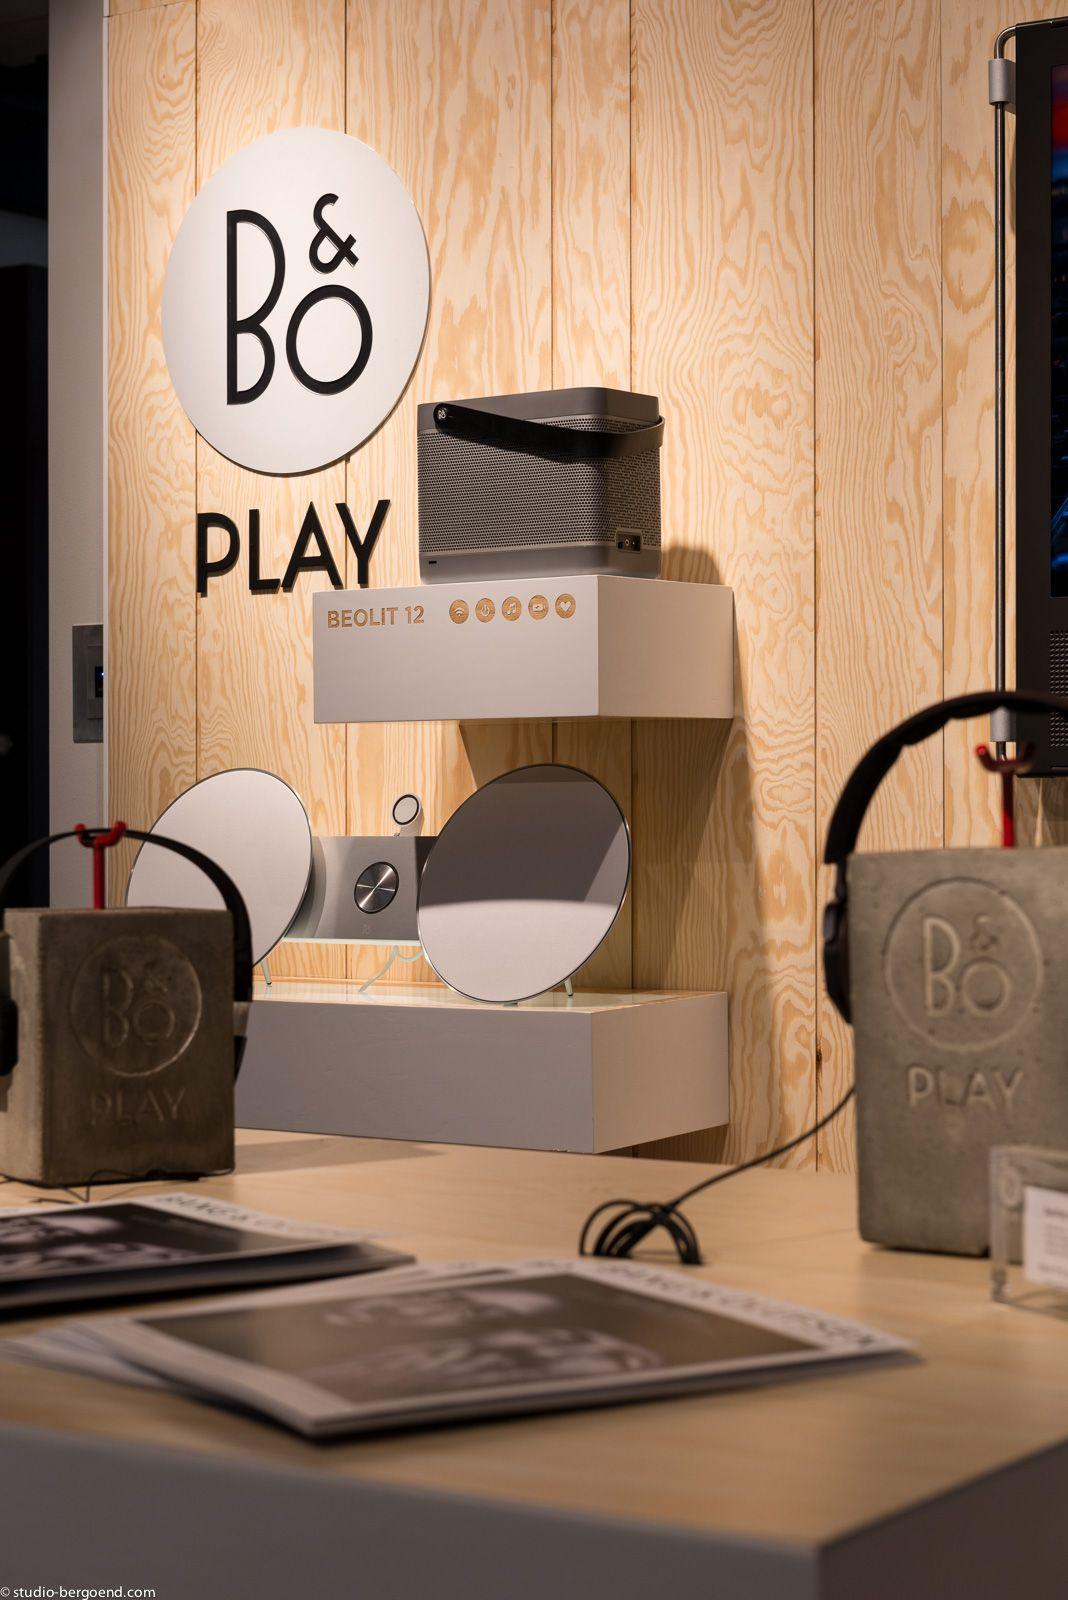 showroom bang olufsen 55 rue de l 39 artisanat 74330 poisy showroom pinterest. Black Bedroom Furniture Sets. Home Design Ideas